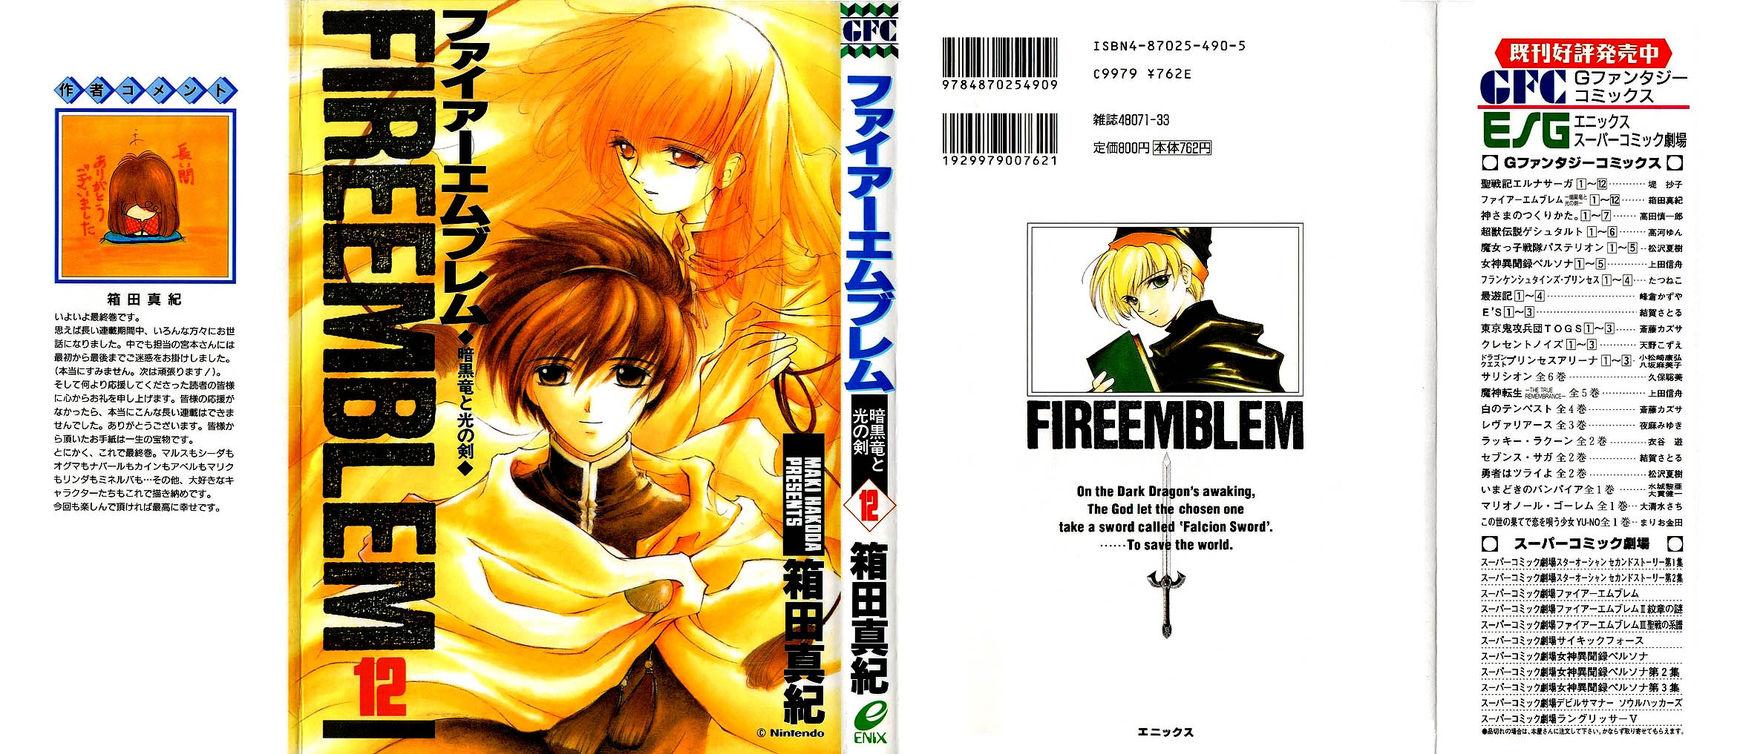 Fire Emblem: Ankokuryuu to Hikari no Ken 54 Page 1